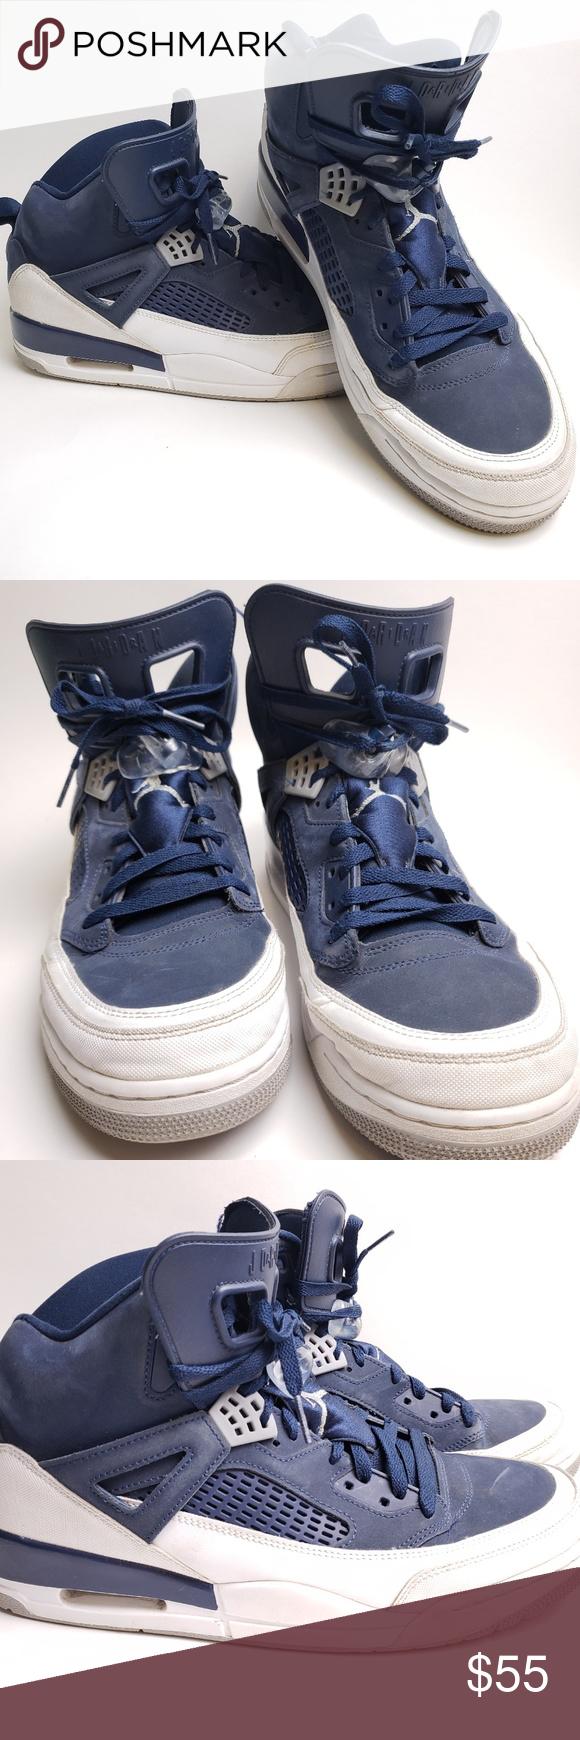 buy popular a4221 68fd0 Nike Jordan Spizike Midnight Navy 315371-406 Men s Size 13, UK 12, EUR